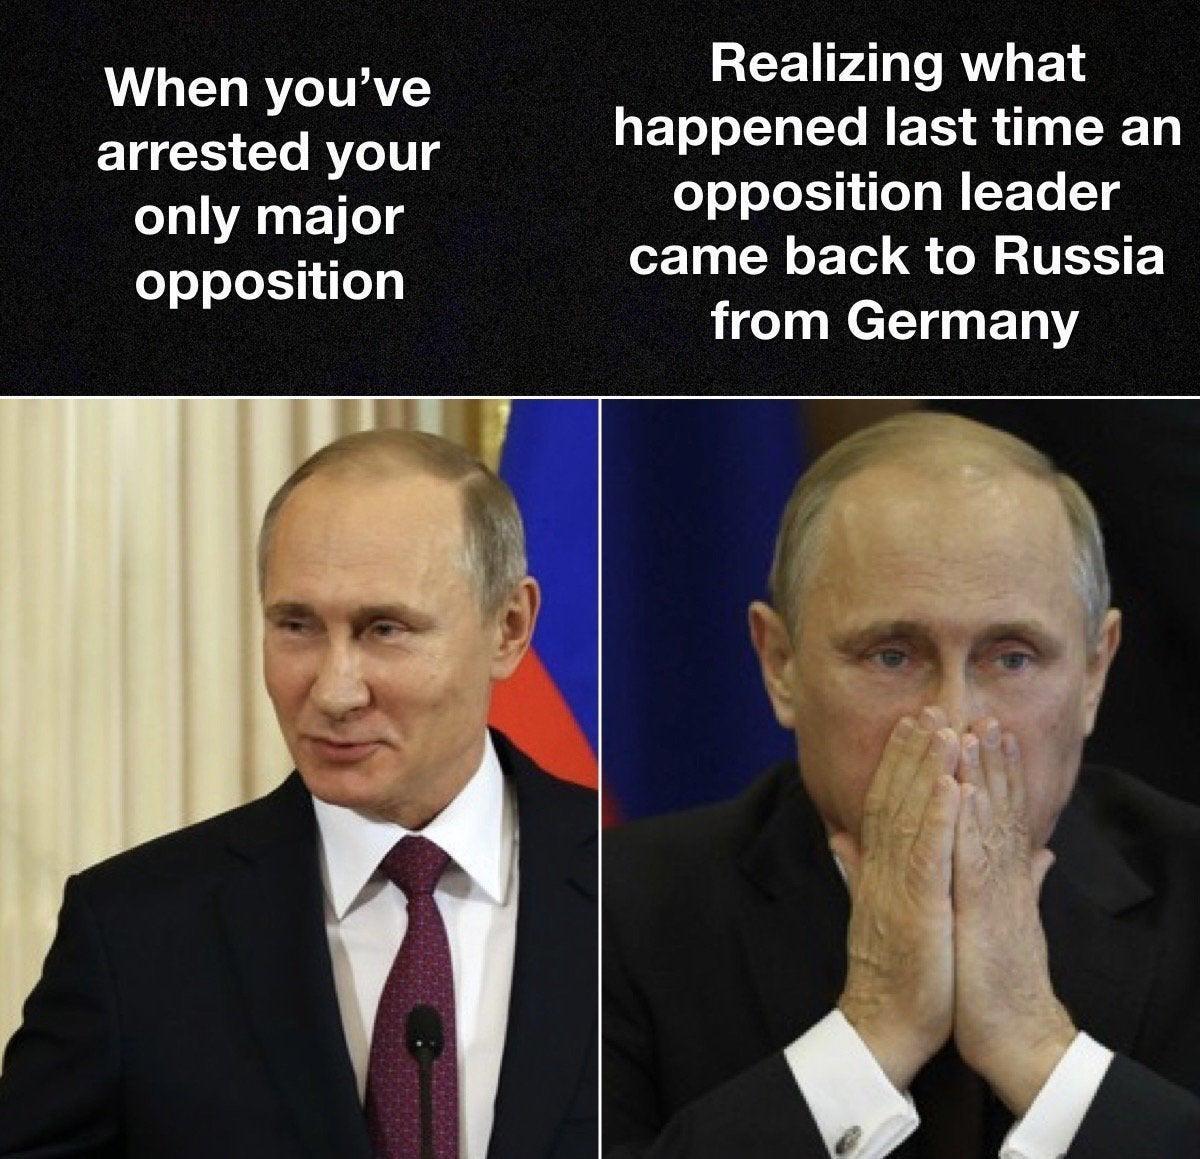 Russians: Ah shit, here we go again. - meme